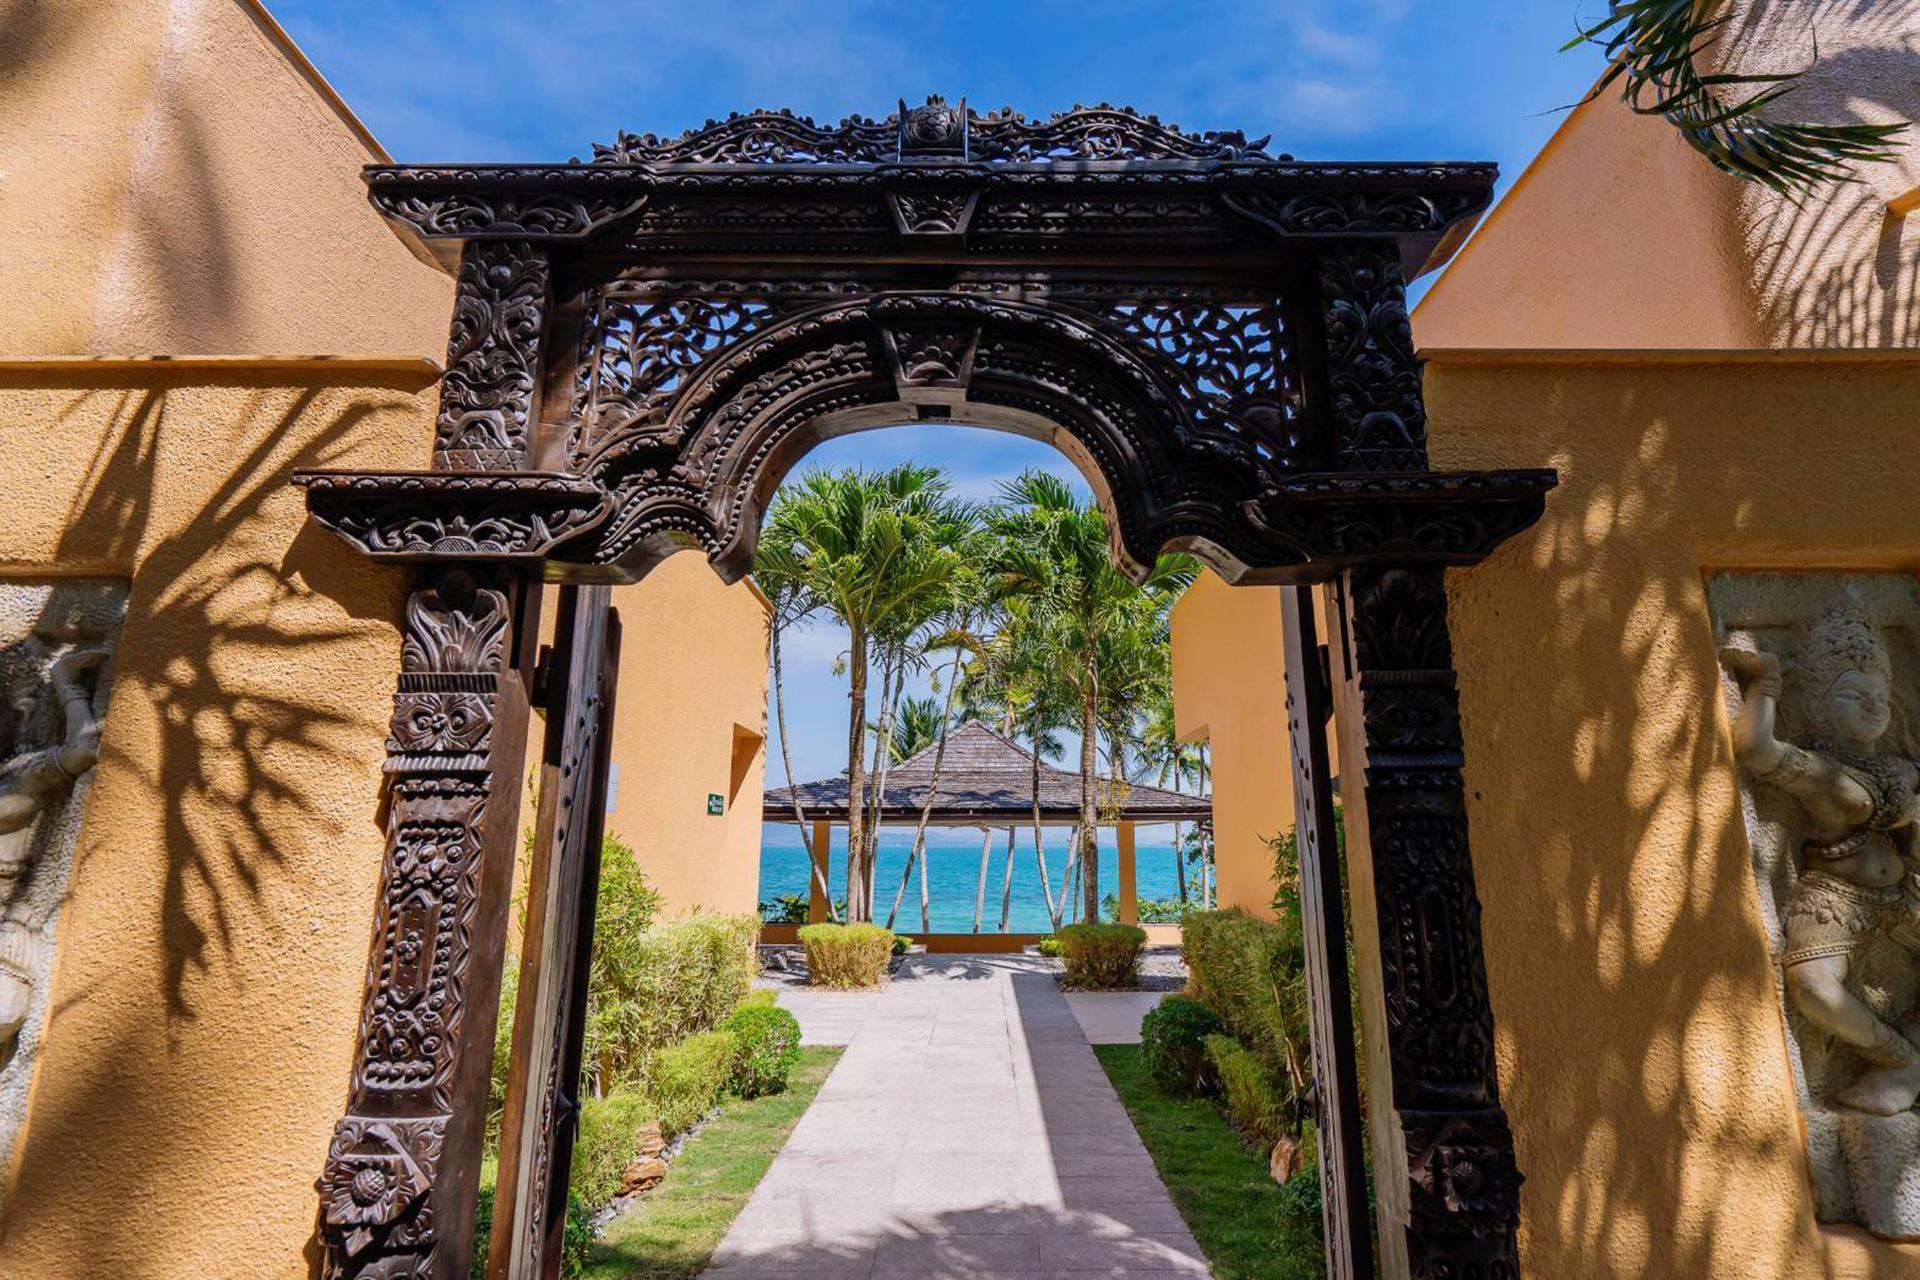 Coral Cove Beachfront Villa  Hotel Managed วิลลา 6 ห้องนอน 5 ห้องน้ำส่วนตัว ขนาด 160 ตร.ม. – คลองสน